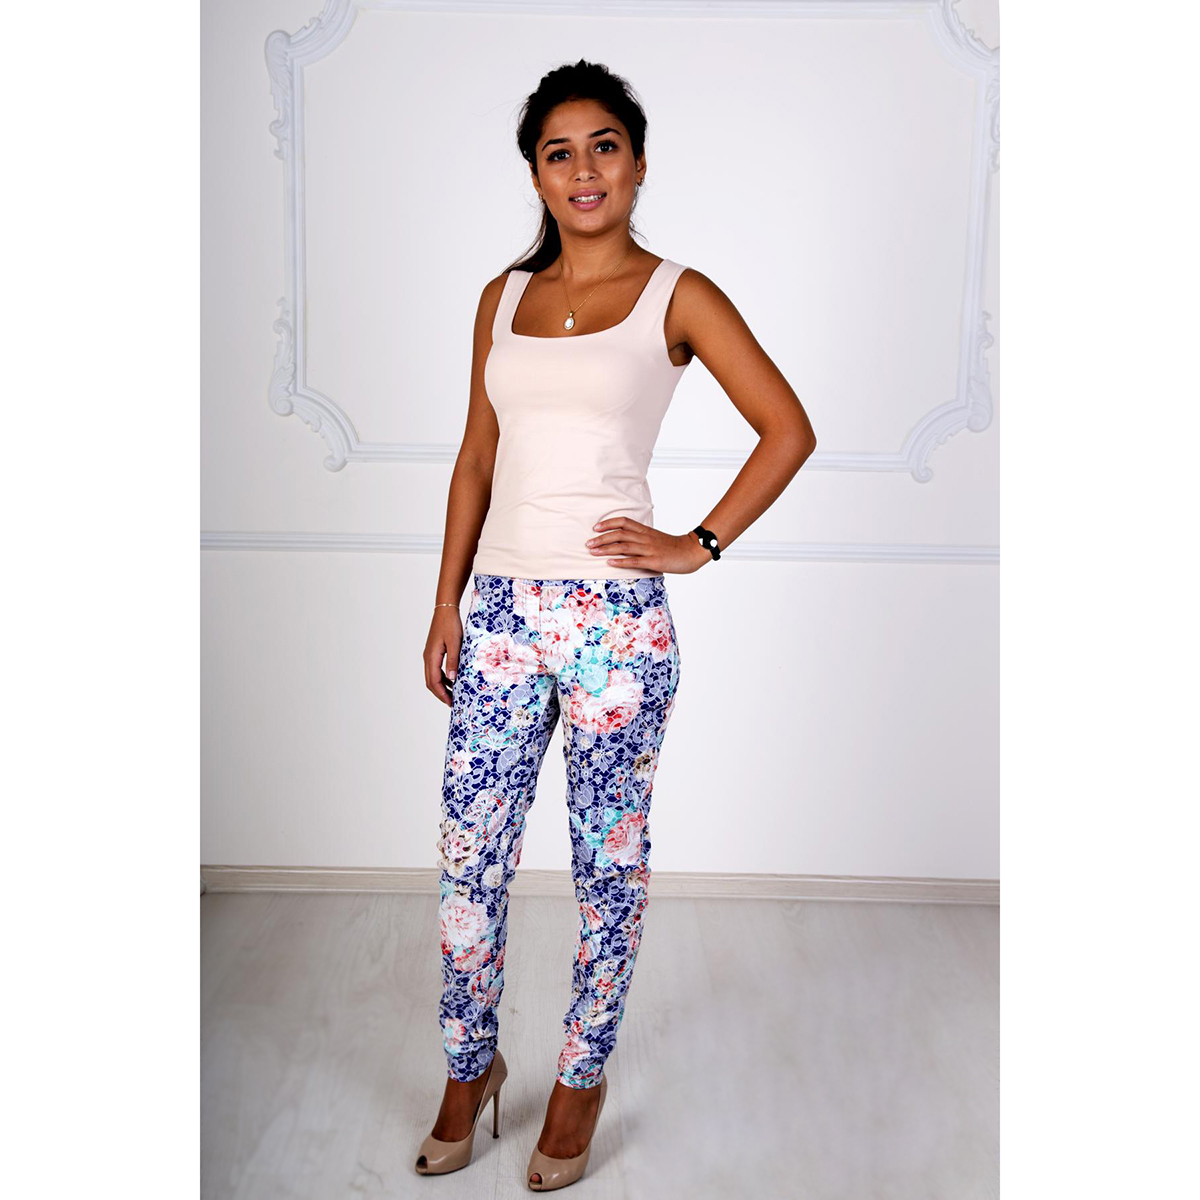 Женские брюки Жаккард арт. 0250, размер 52Брюки<br>Обхват талии:85 см<br>Обхват бедер:112 см<br>Рост:167 см<br><br>Тип: Жен. брюки<br>Размер: 52<br>Материал: Жаккард